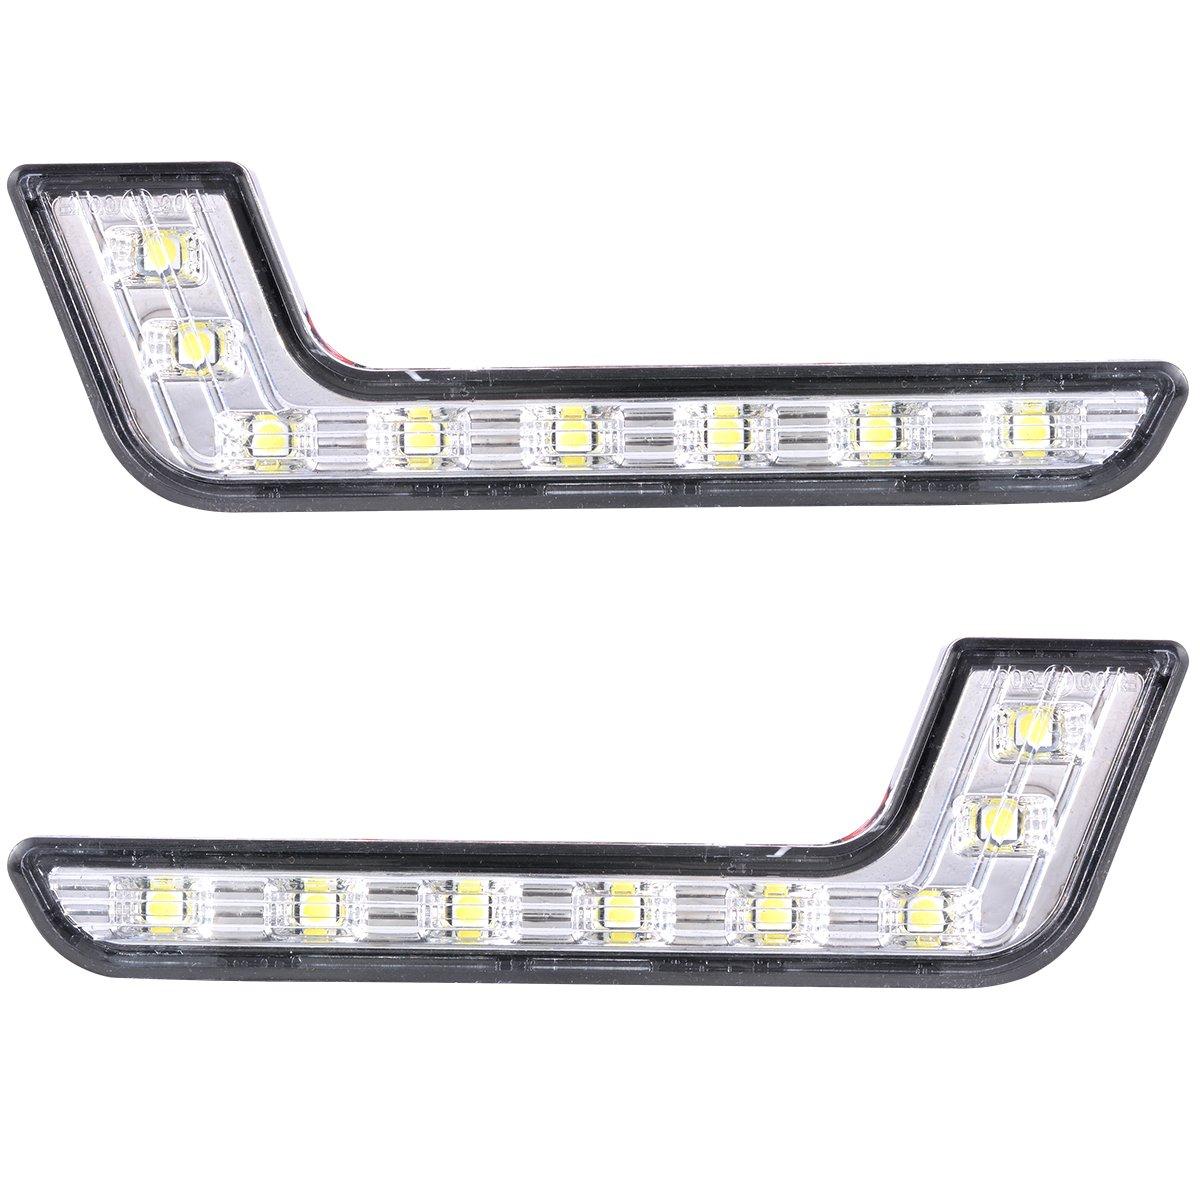 XCSOURCE 2pcs 8-LED White LED DRL Daytime Running Light L Shape Front Fog Light for Mercedes-Benz MA145